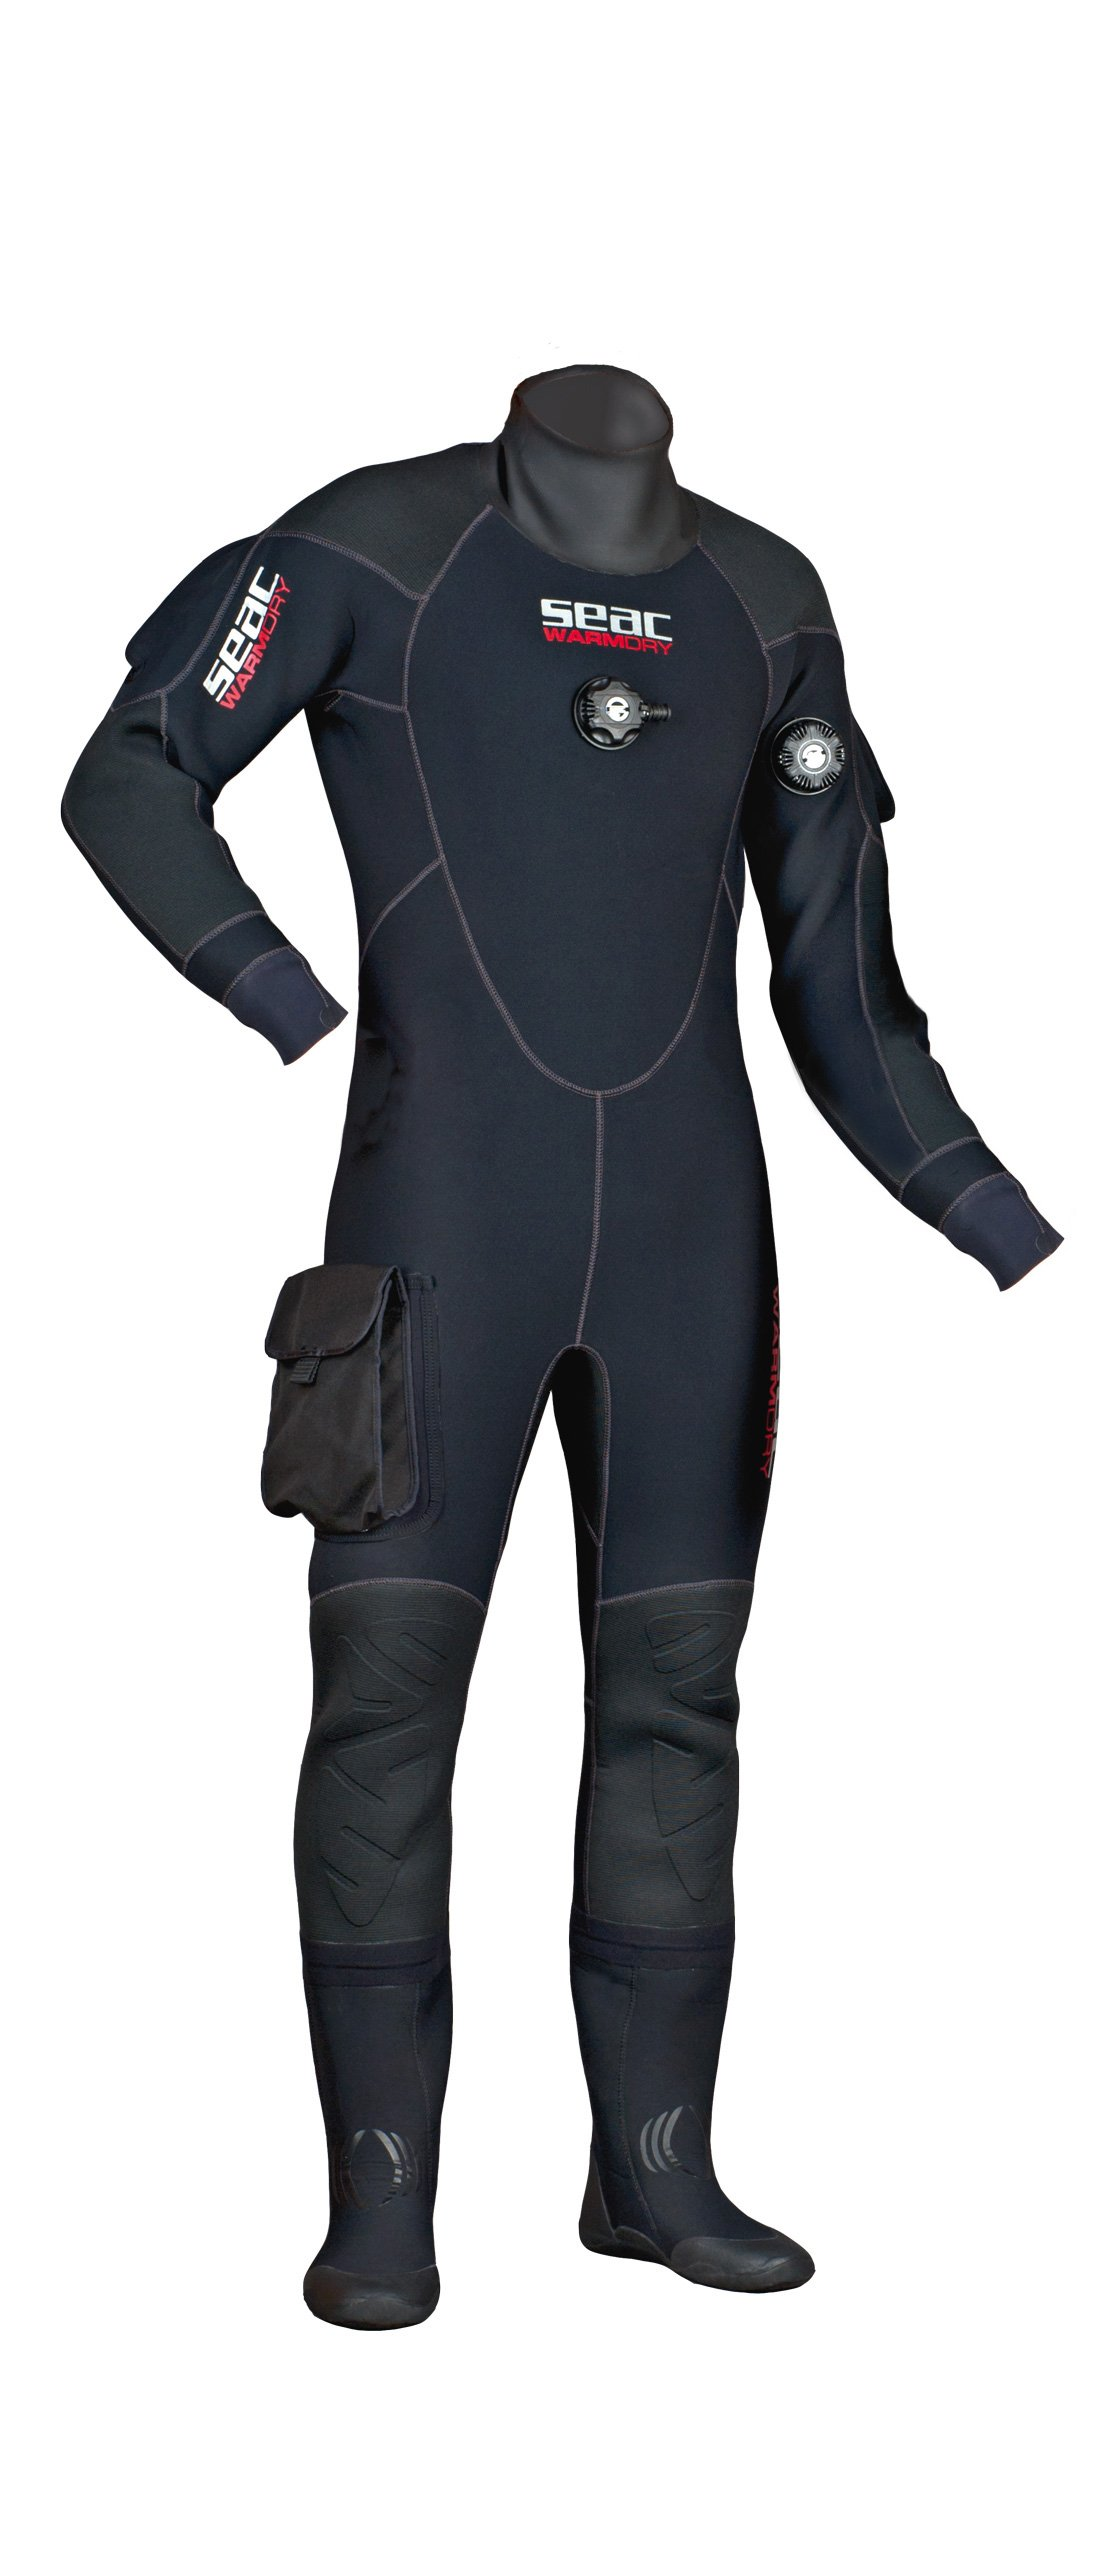 SEAC Men's Warmdry 4mm Neoprene Dry Suit, Black, Small